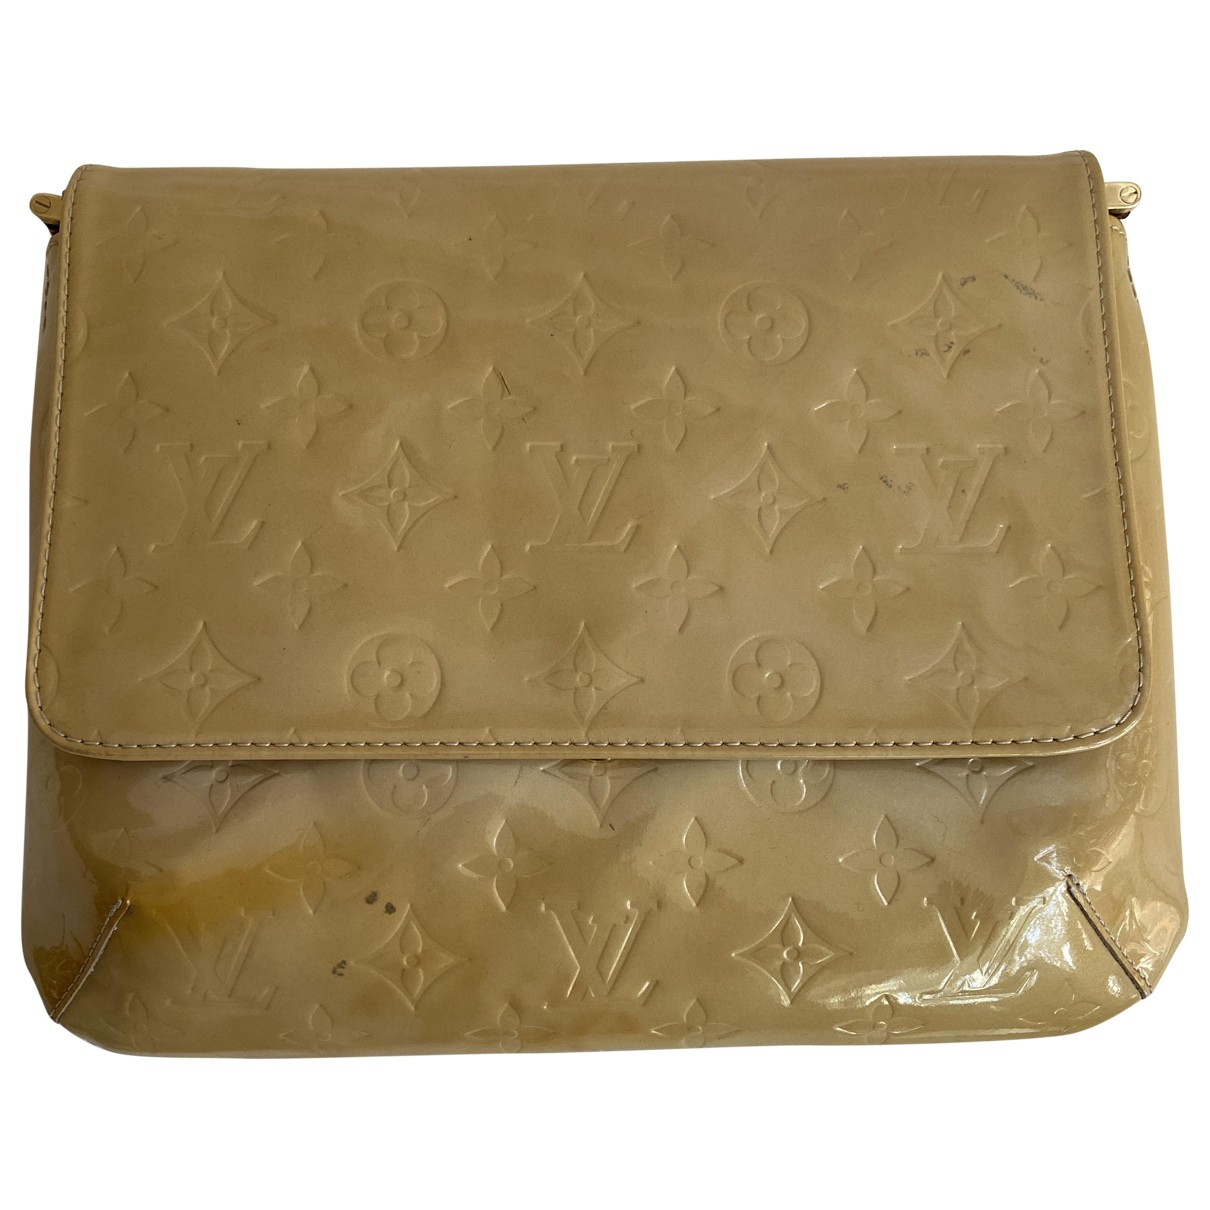 Louis Vuitton Thompson Beige Patent leather handbag for Women \N